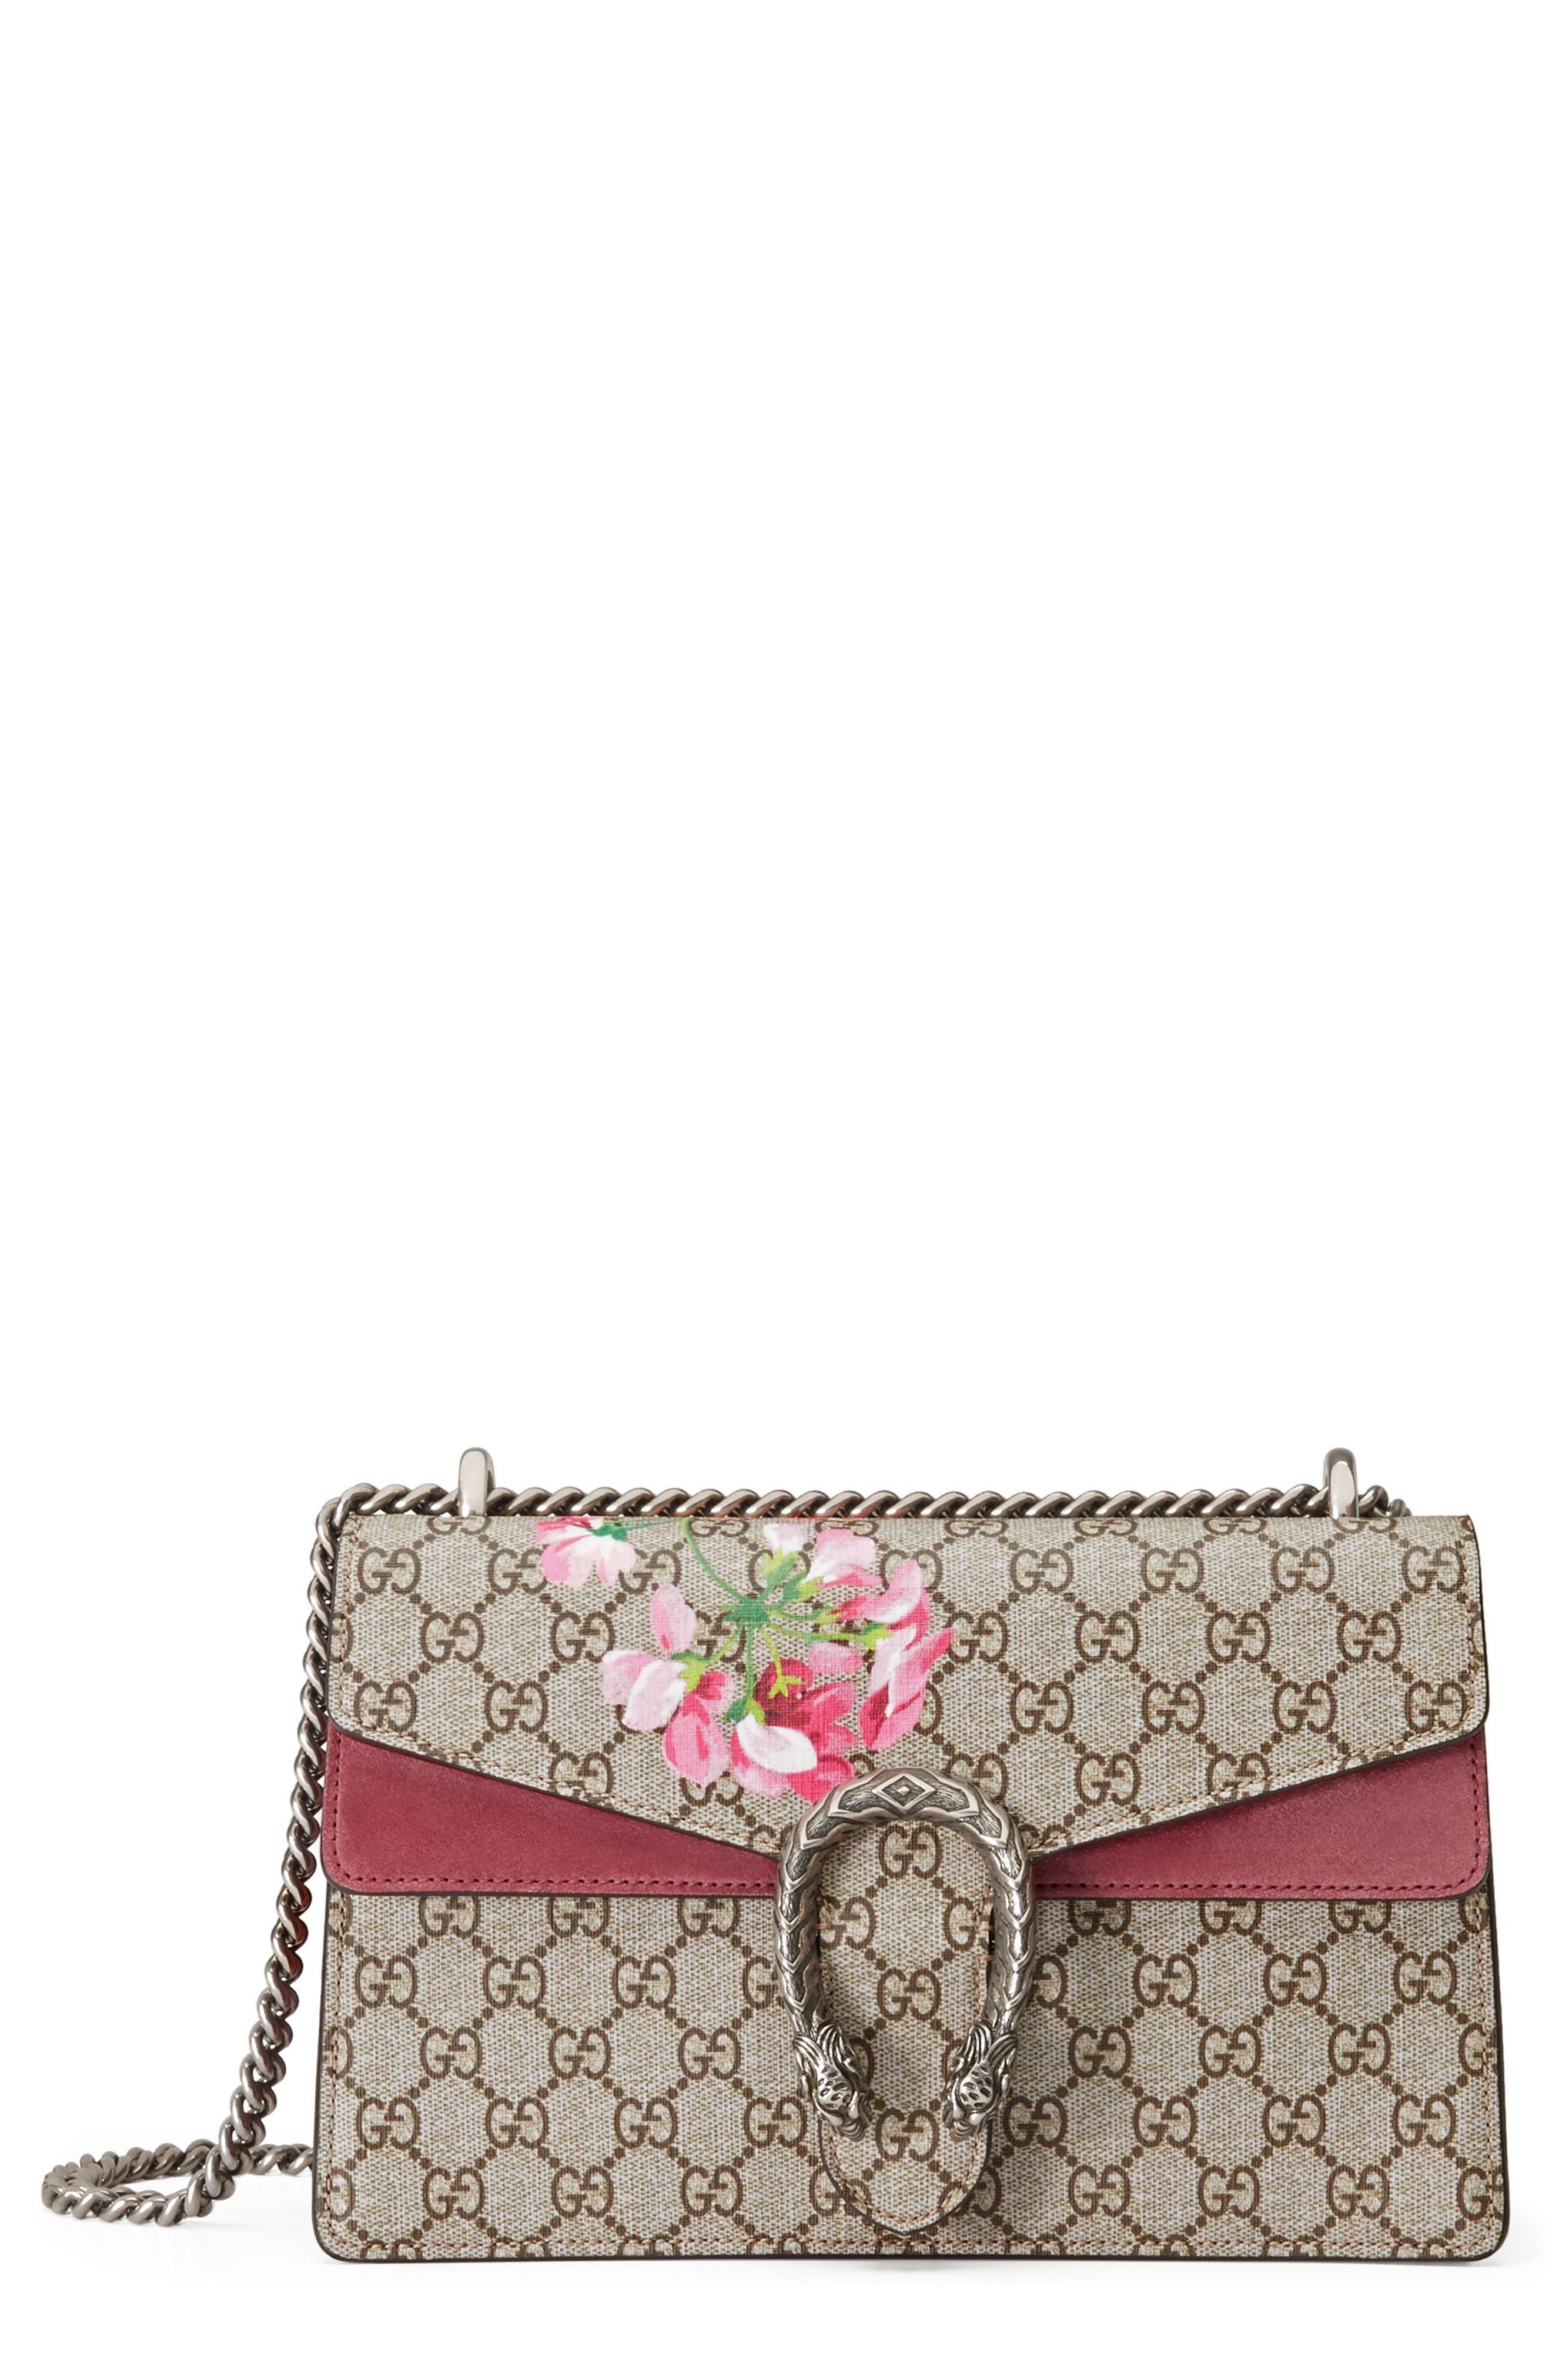 Small Dionysus Floral GG Supreme Canvas Shoulder Bag,                         Main,                         color,